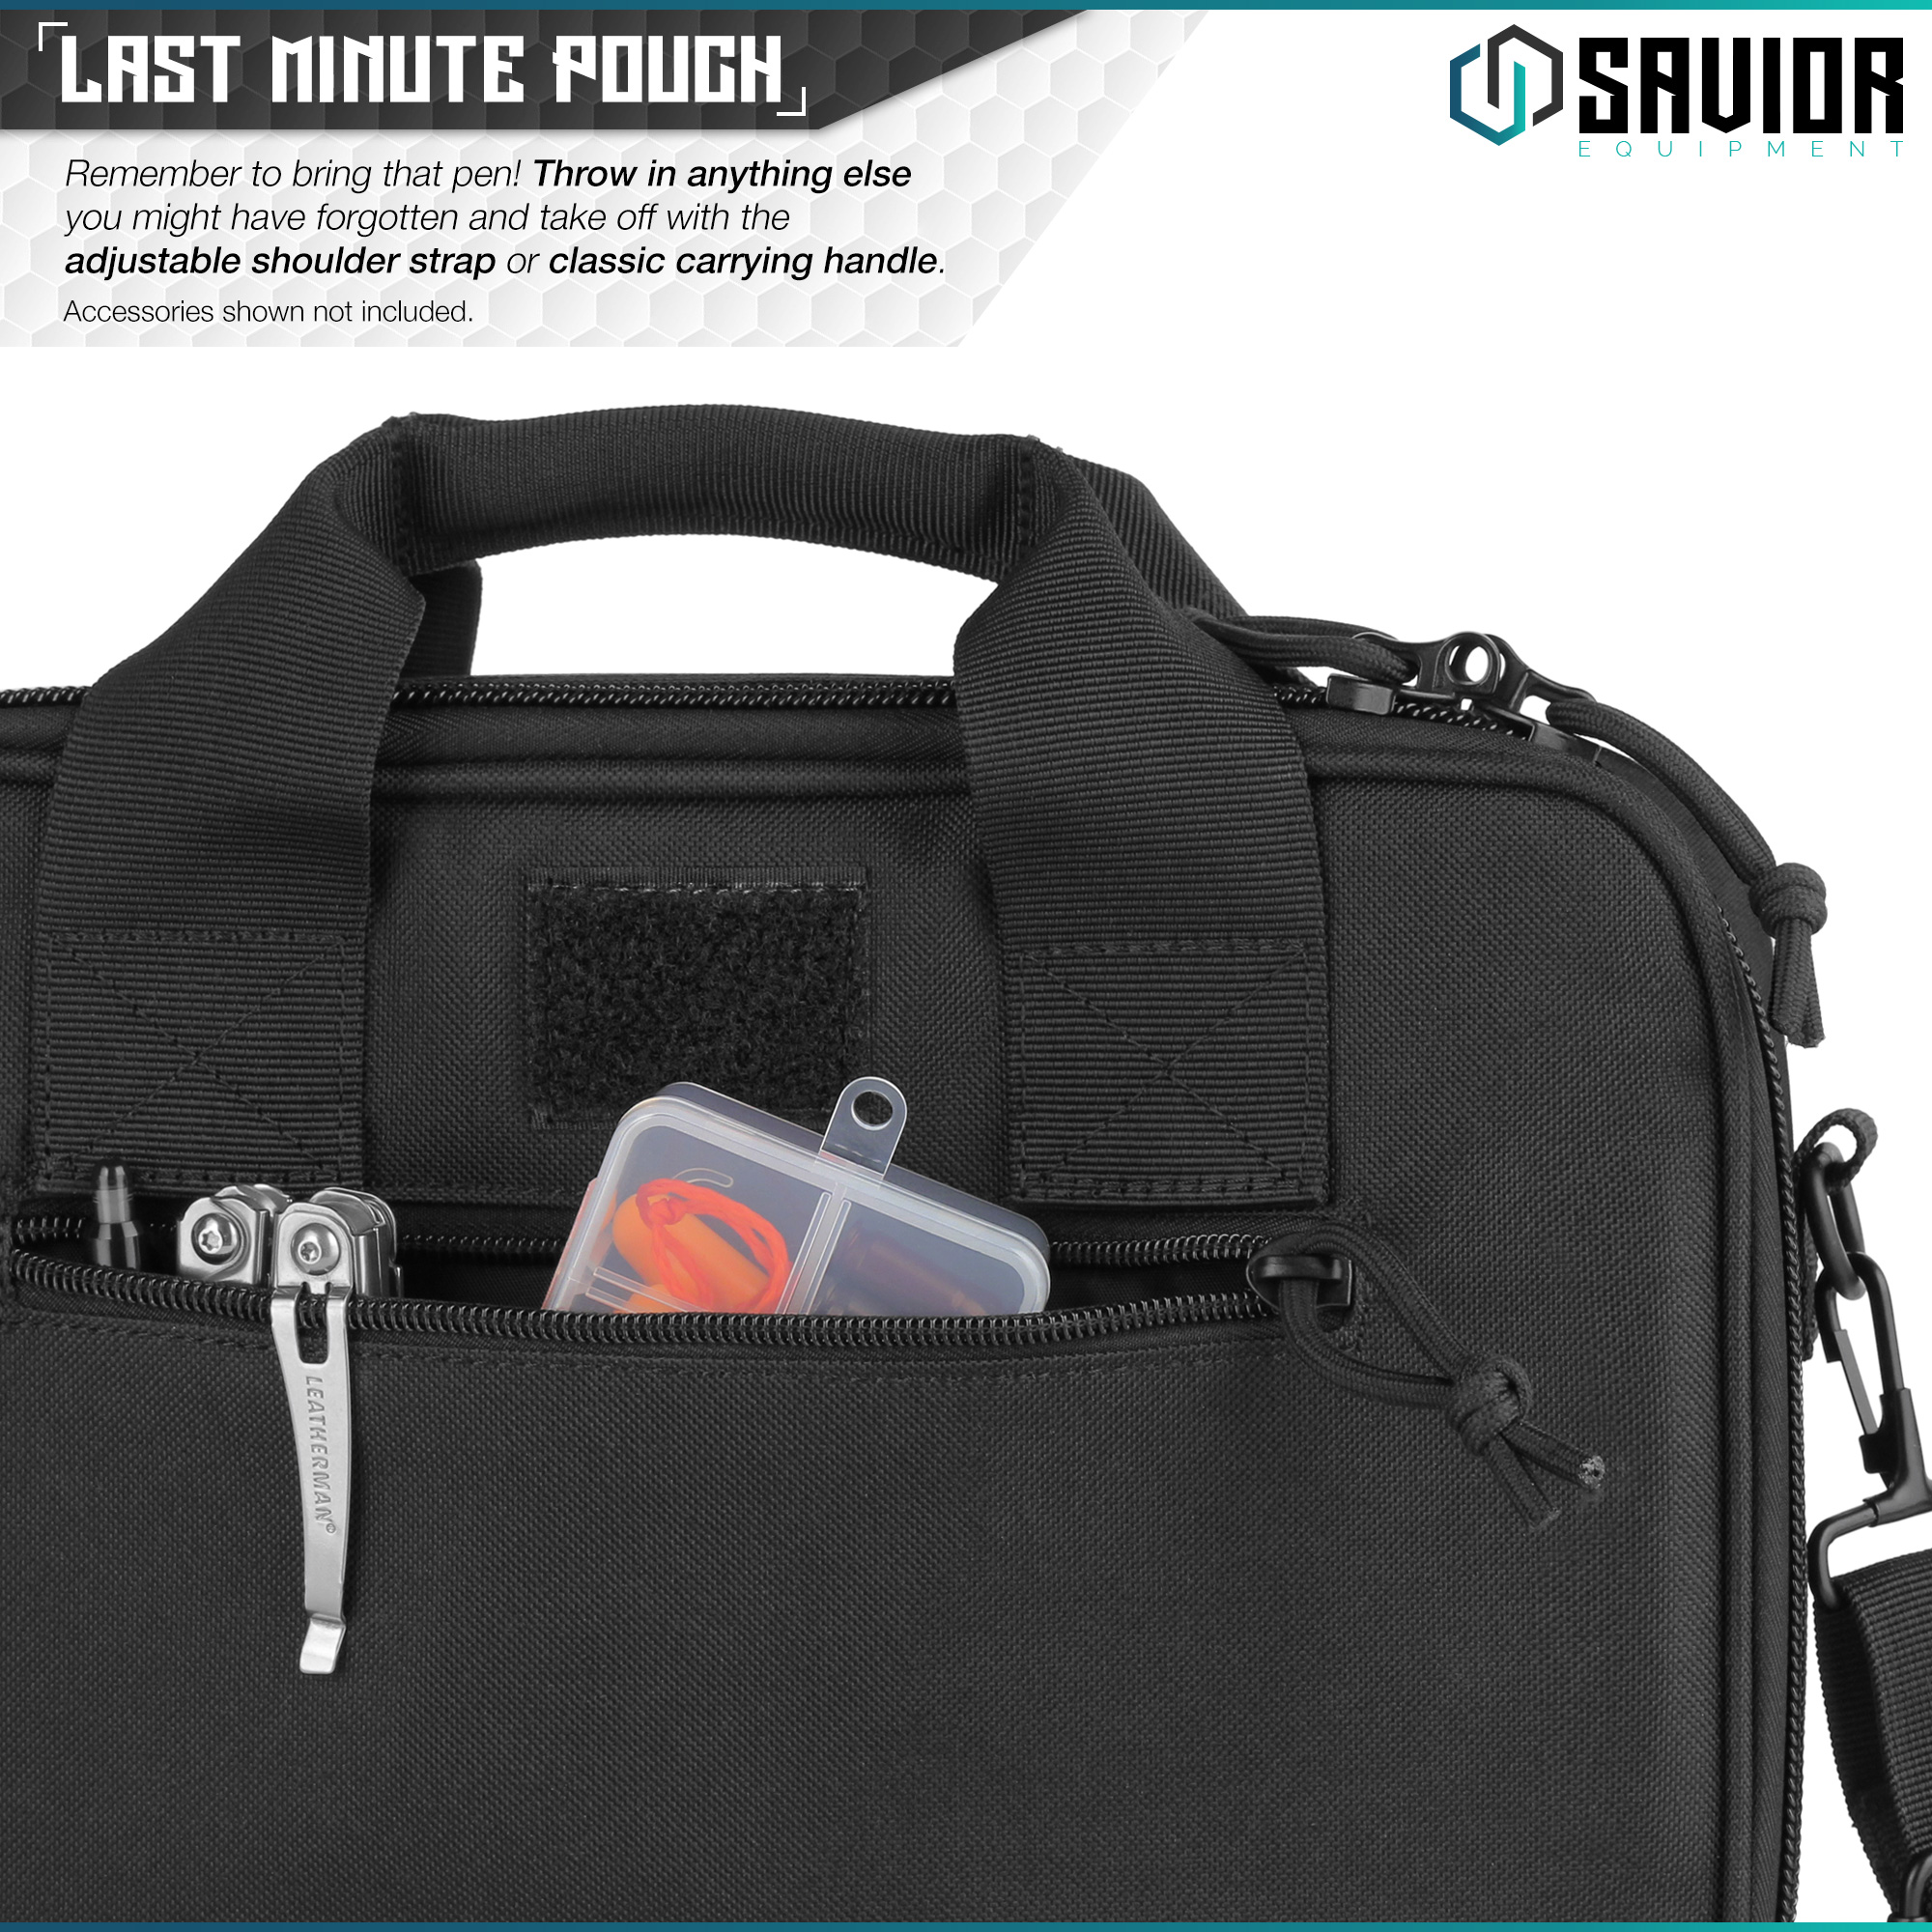 thumbnail 18 - 034-SAVIOR-034-Padded-Discreet-Double-Handgun-Bag-Pistol-Storage-Case-w-Mag-Pouch-Slot